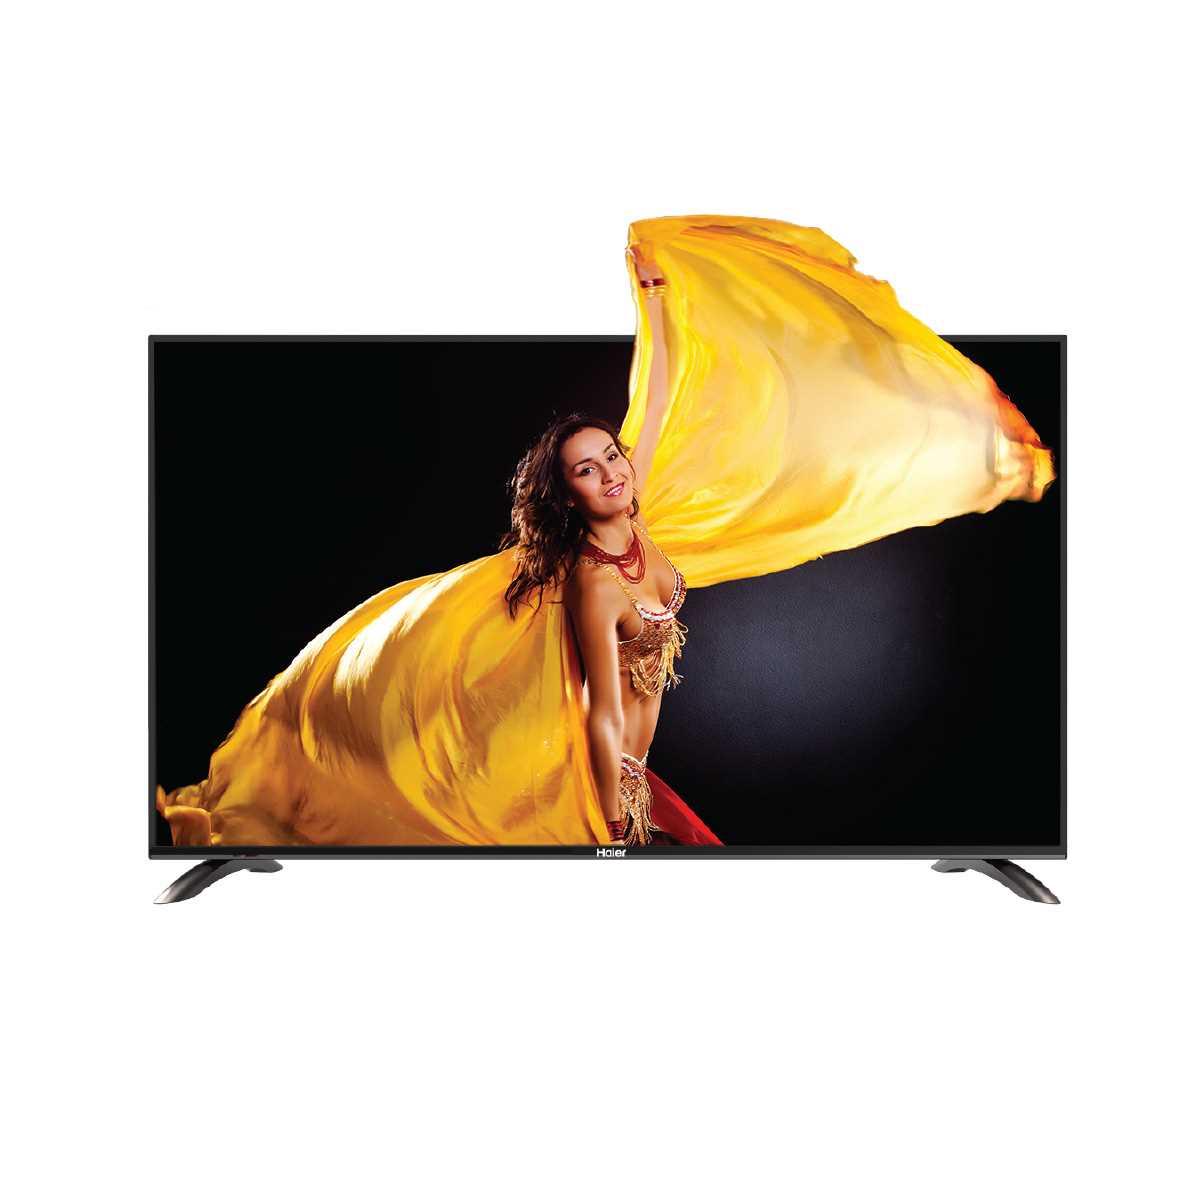 Haier LE55B9500U 55 Inch 4K Ultra HD LED Television